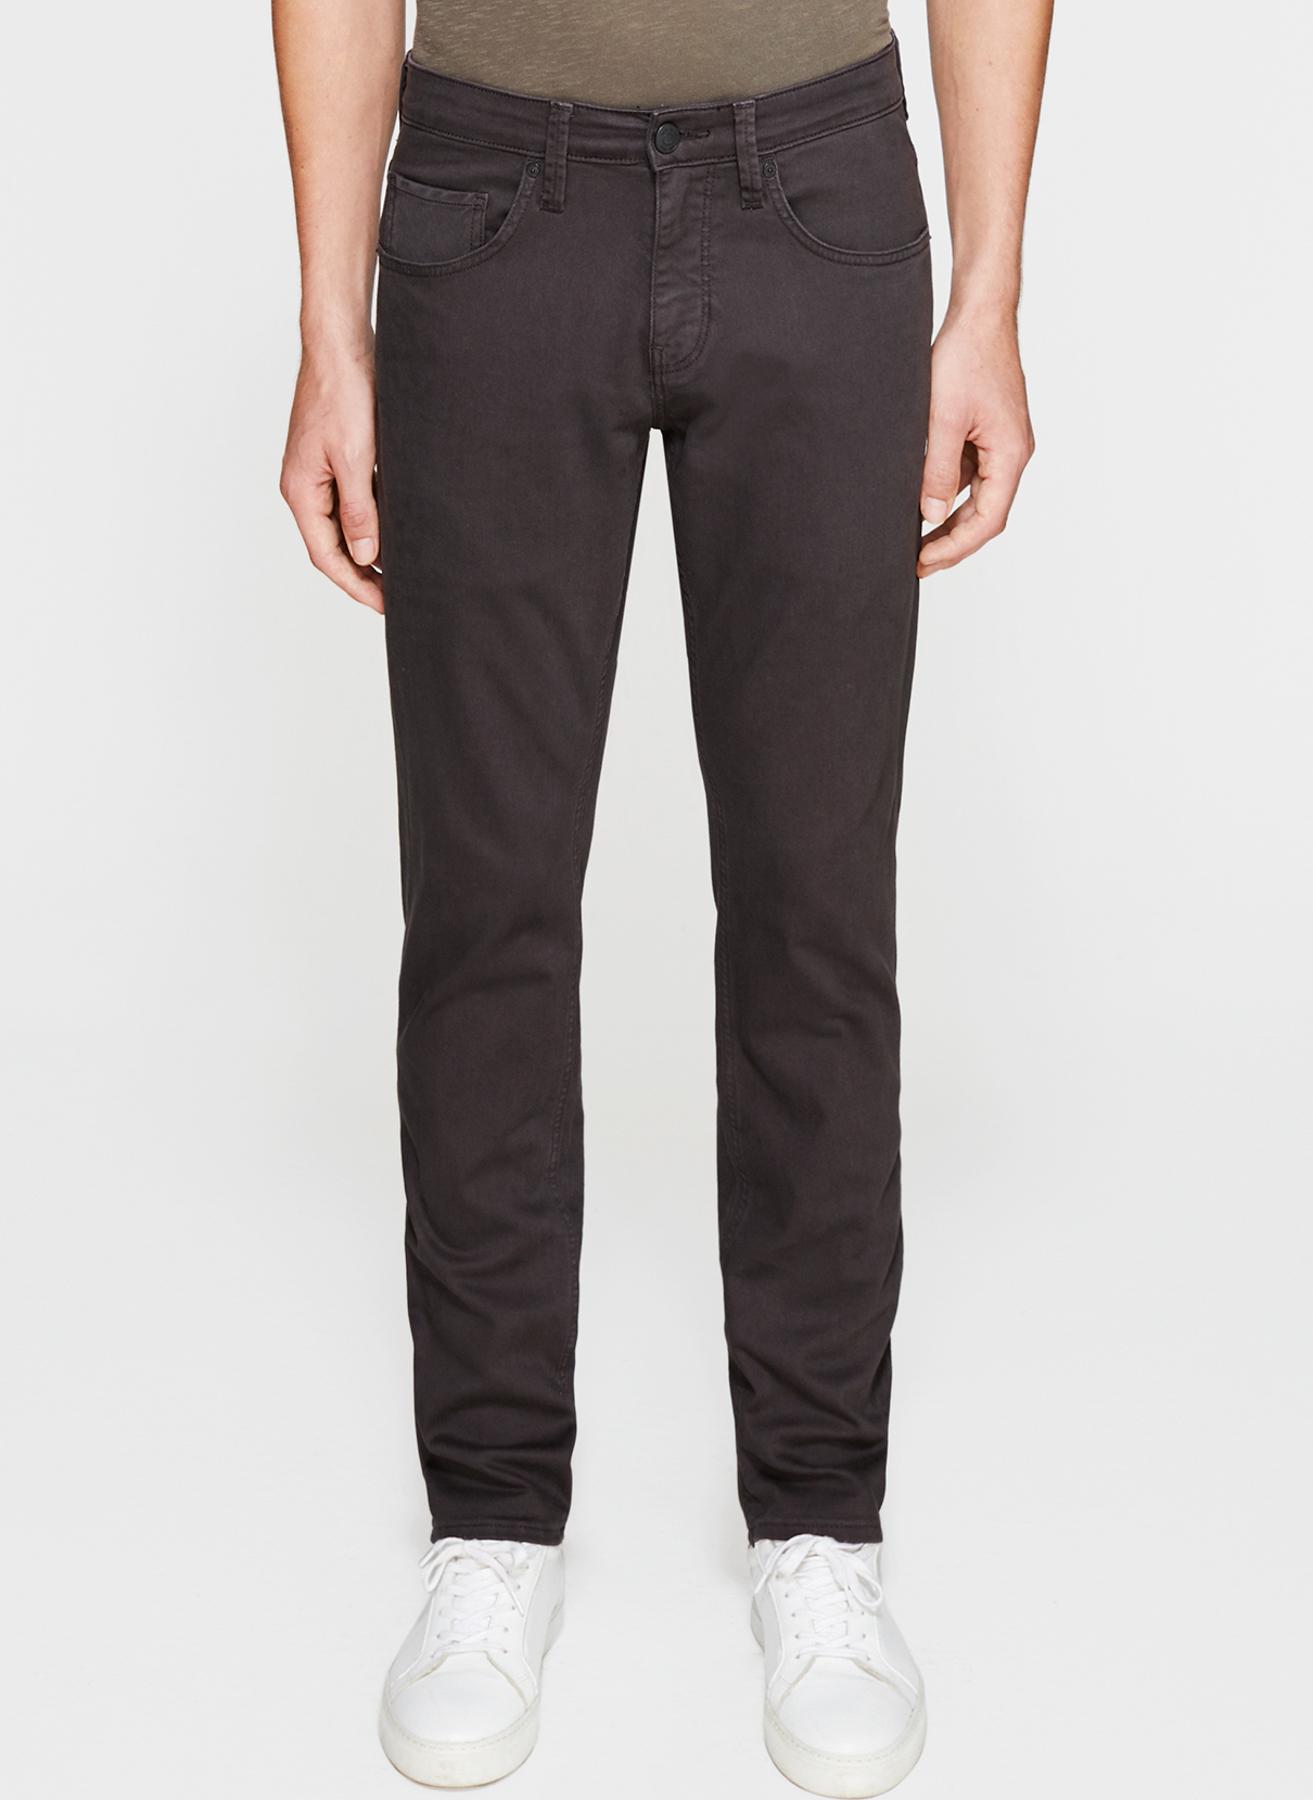 Mavi Klasik Pantolon 36-34 5001634327035 Ürün Resmi